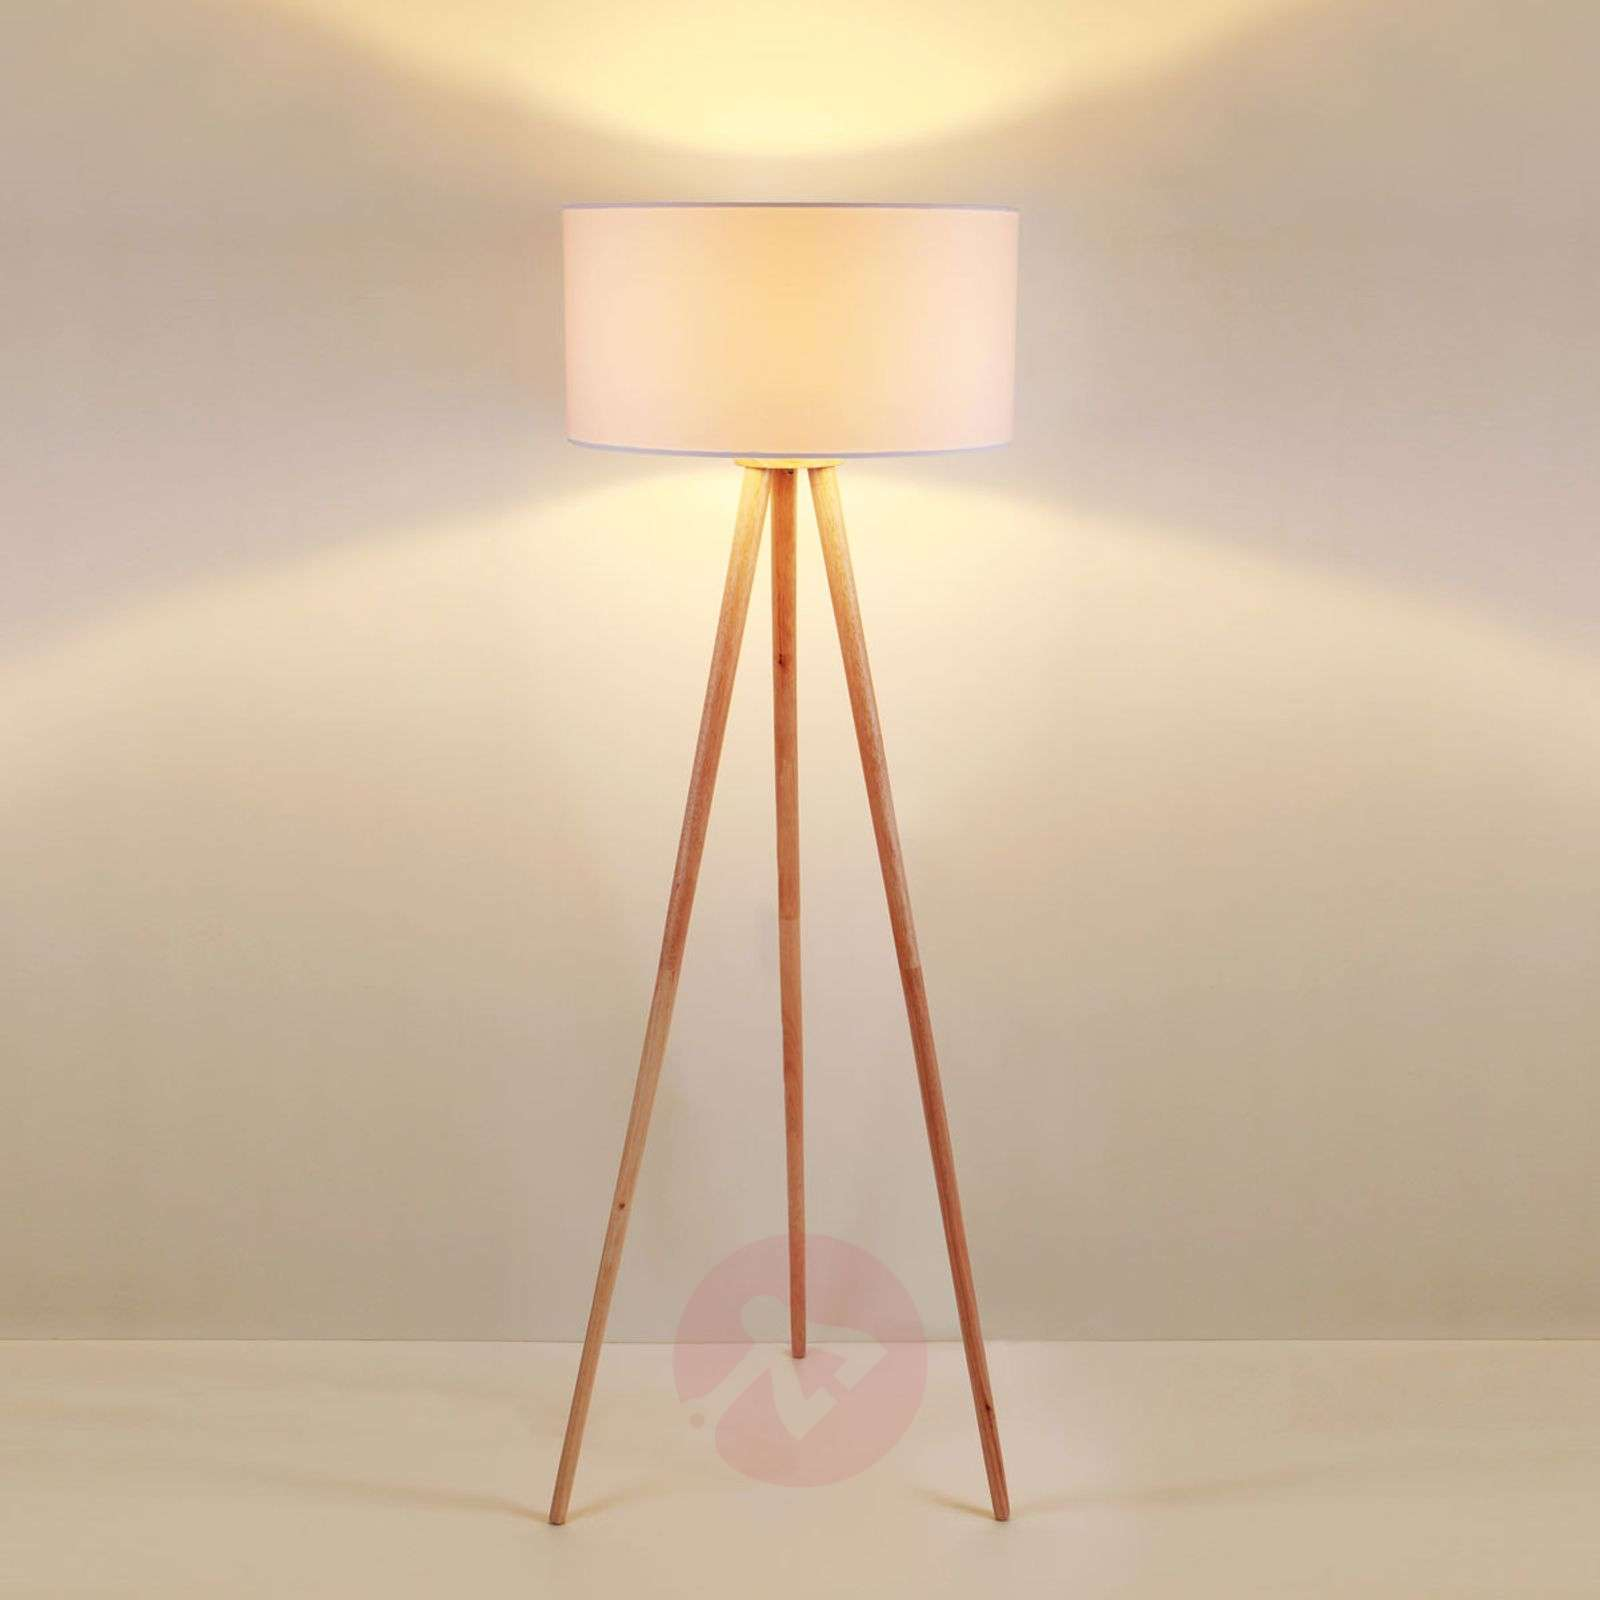 Tripod fabric floor lamp Charlia-9620799-01